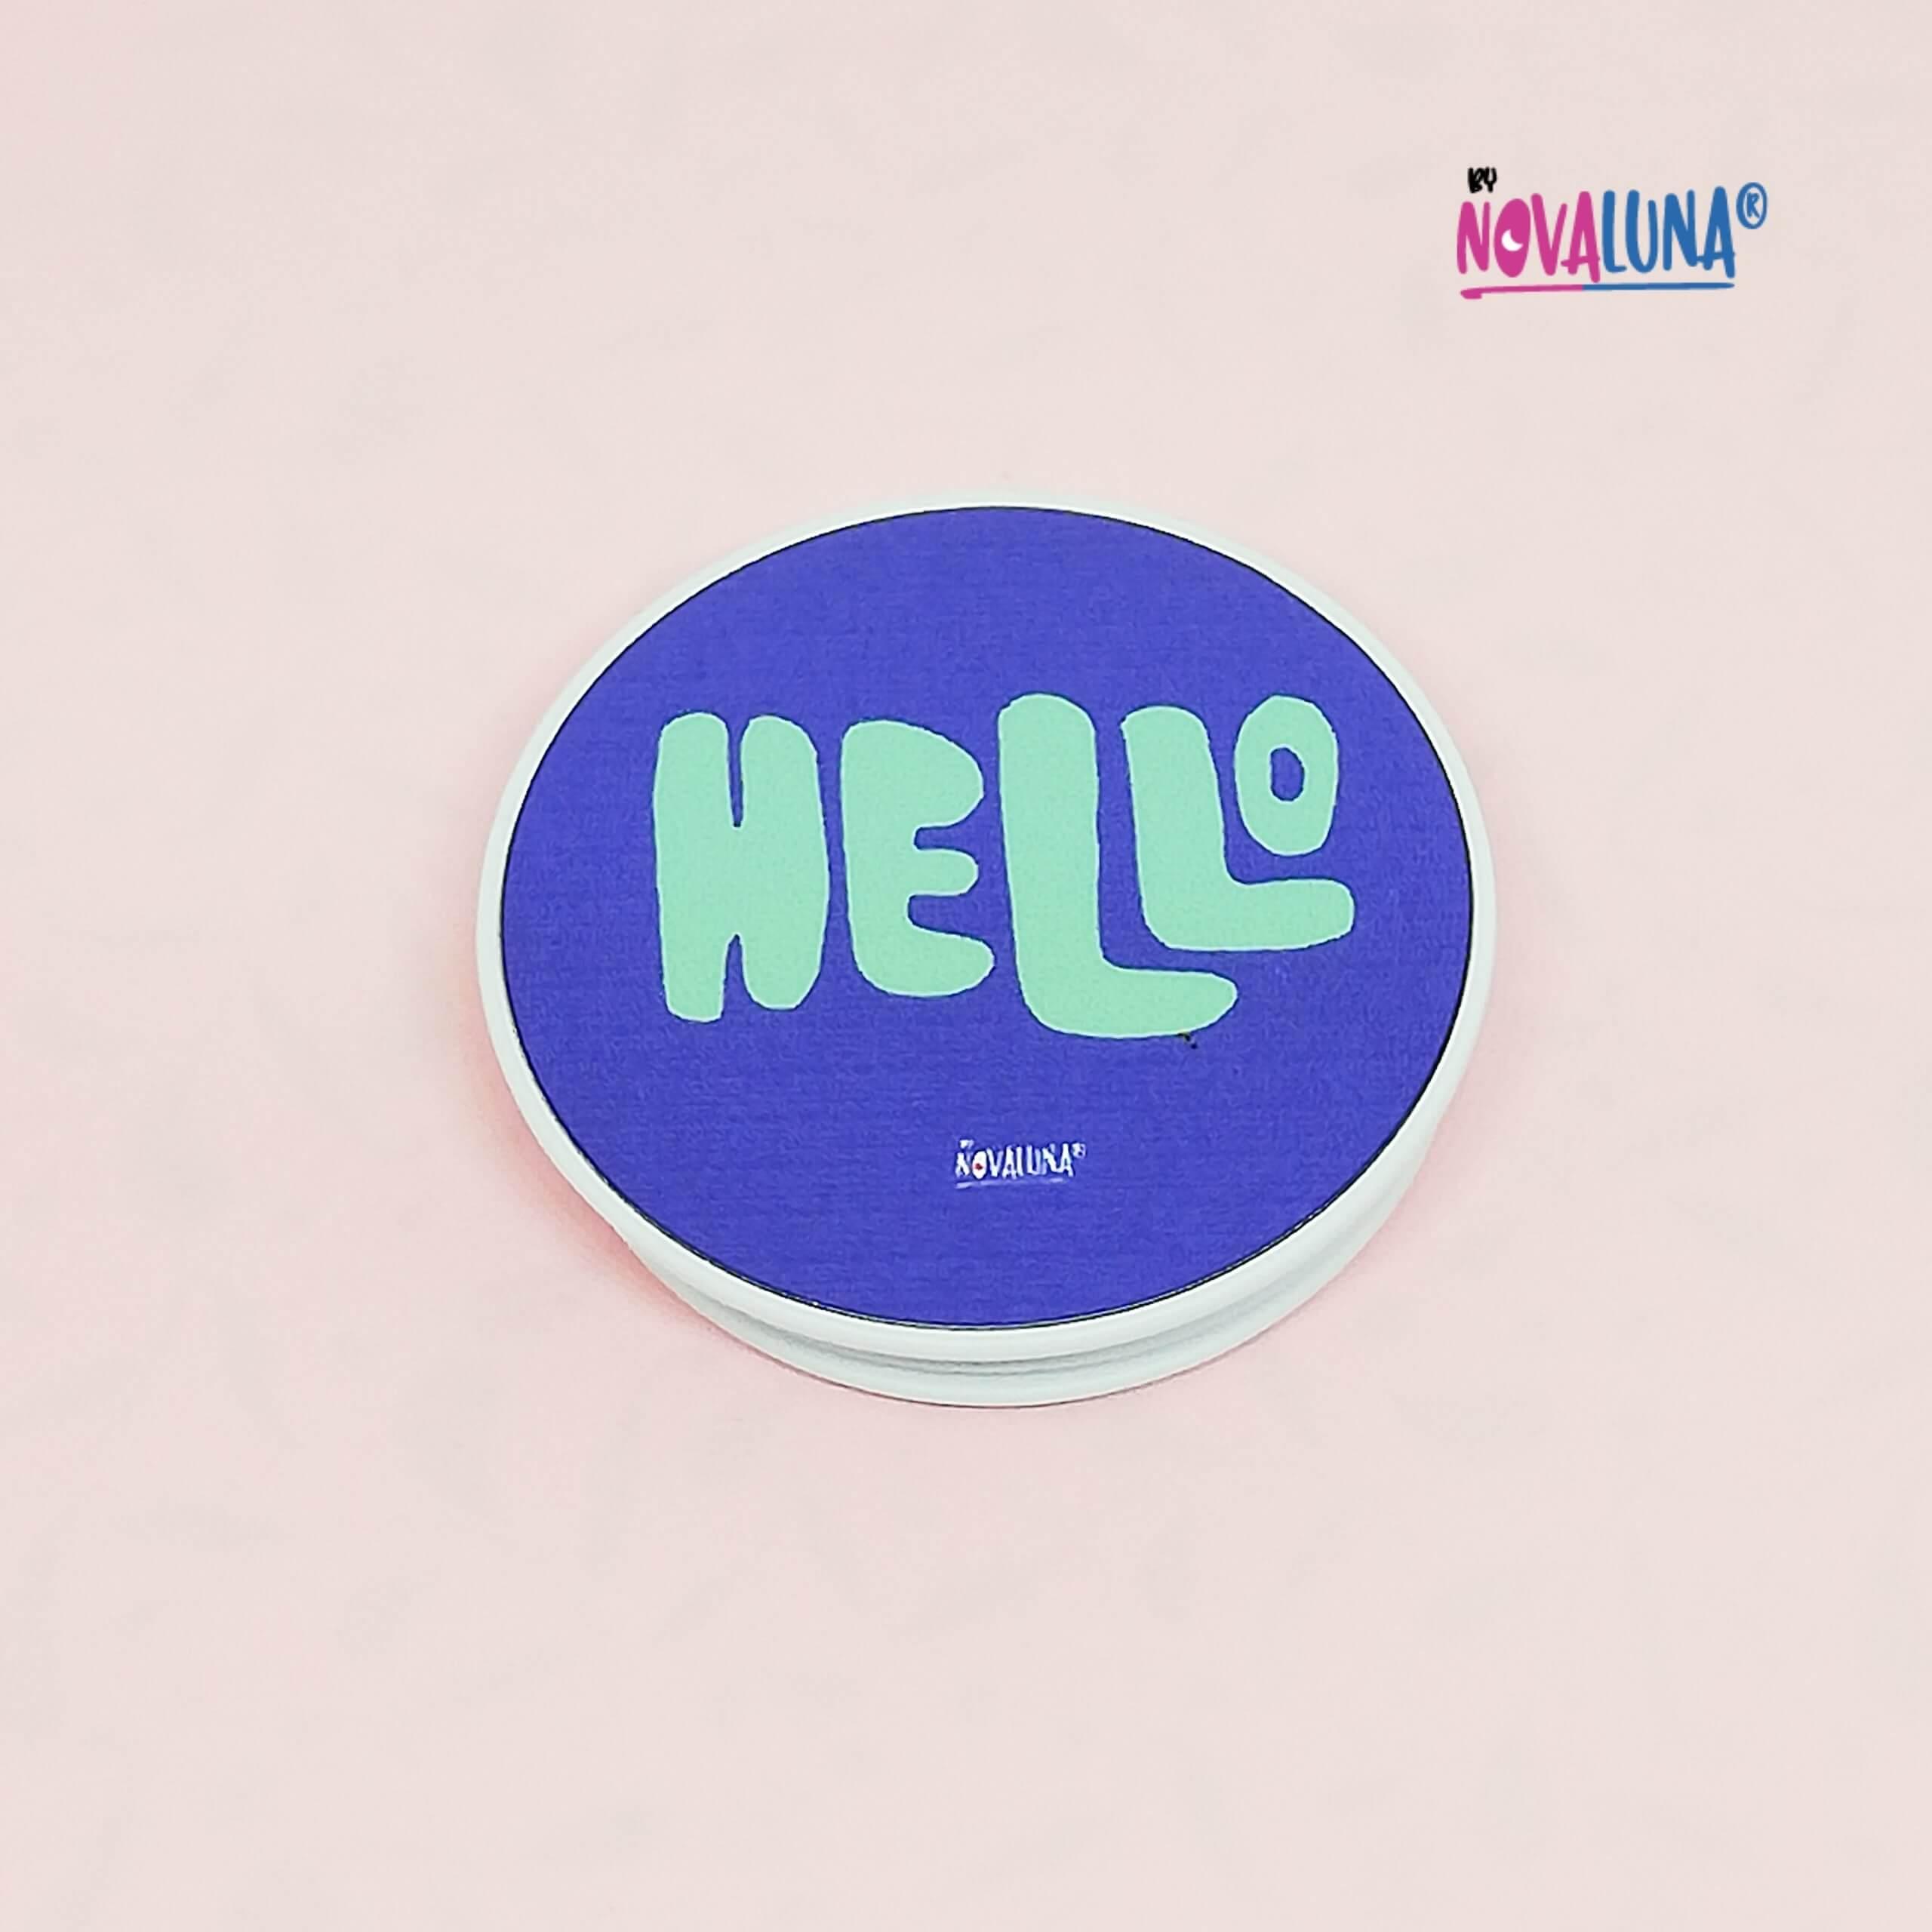 Popsocket hello_1